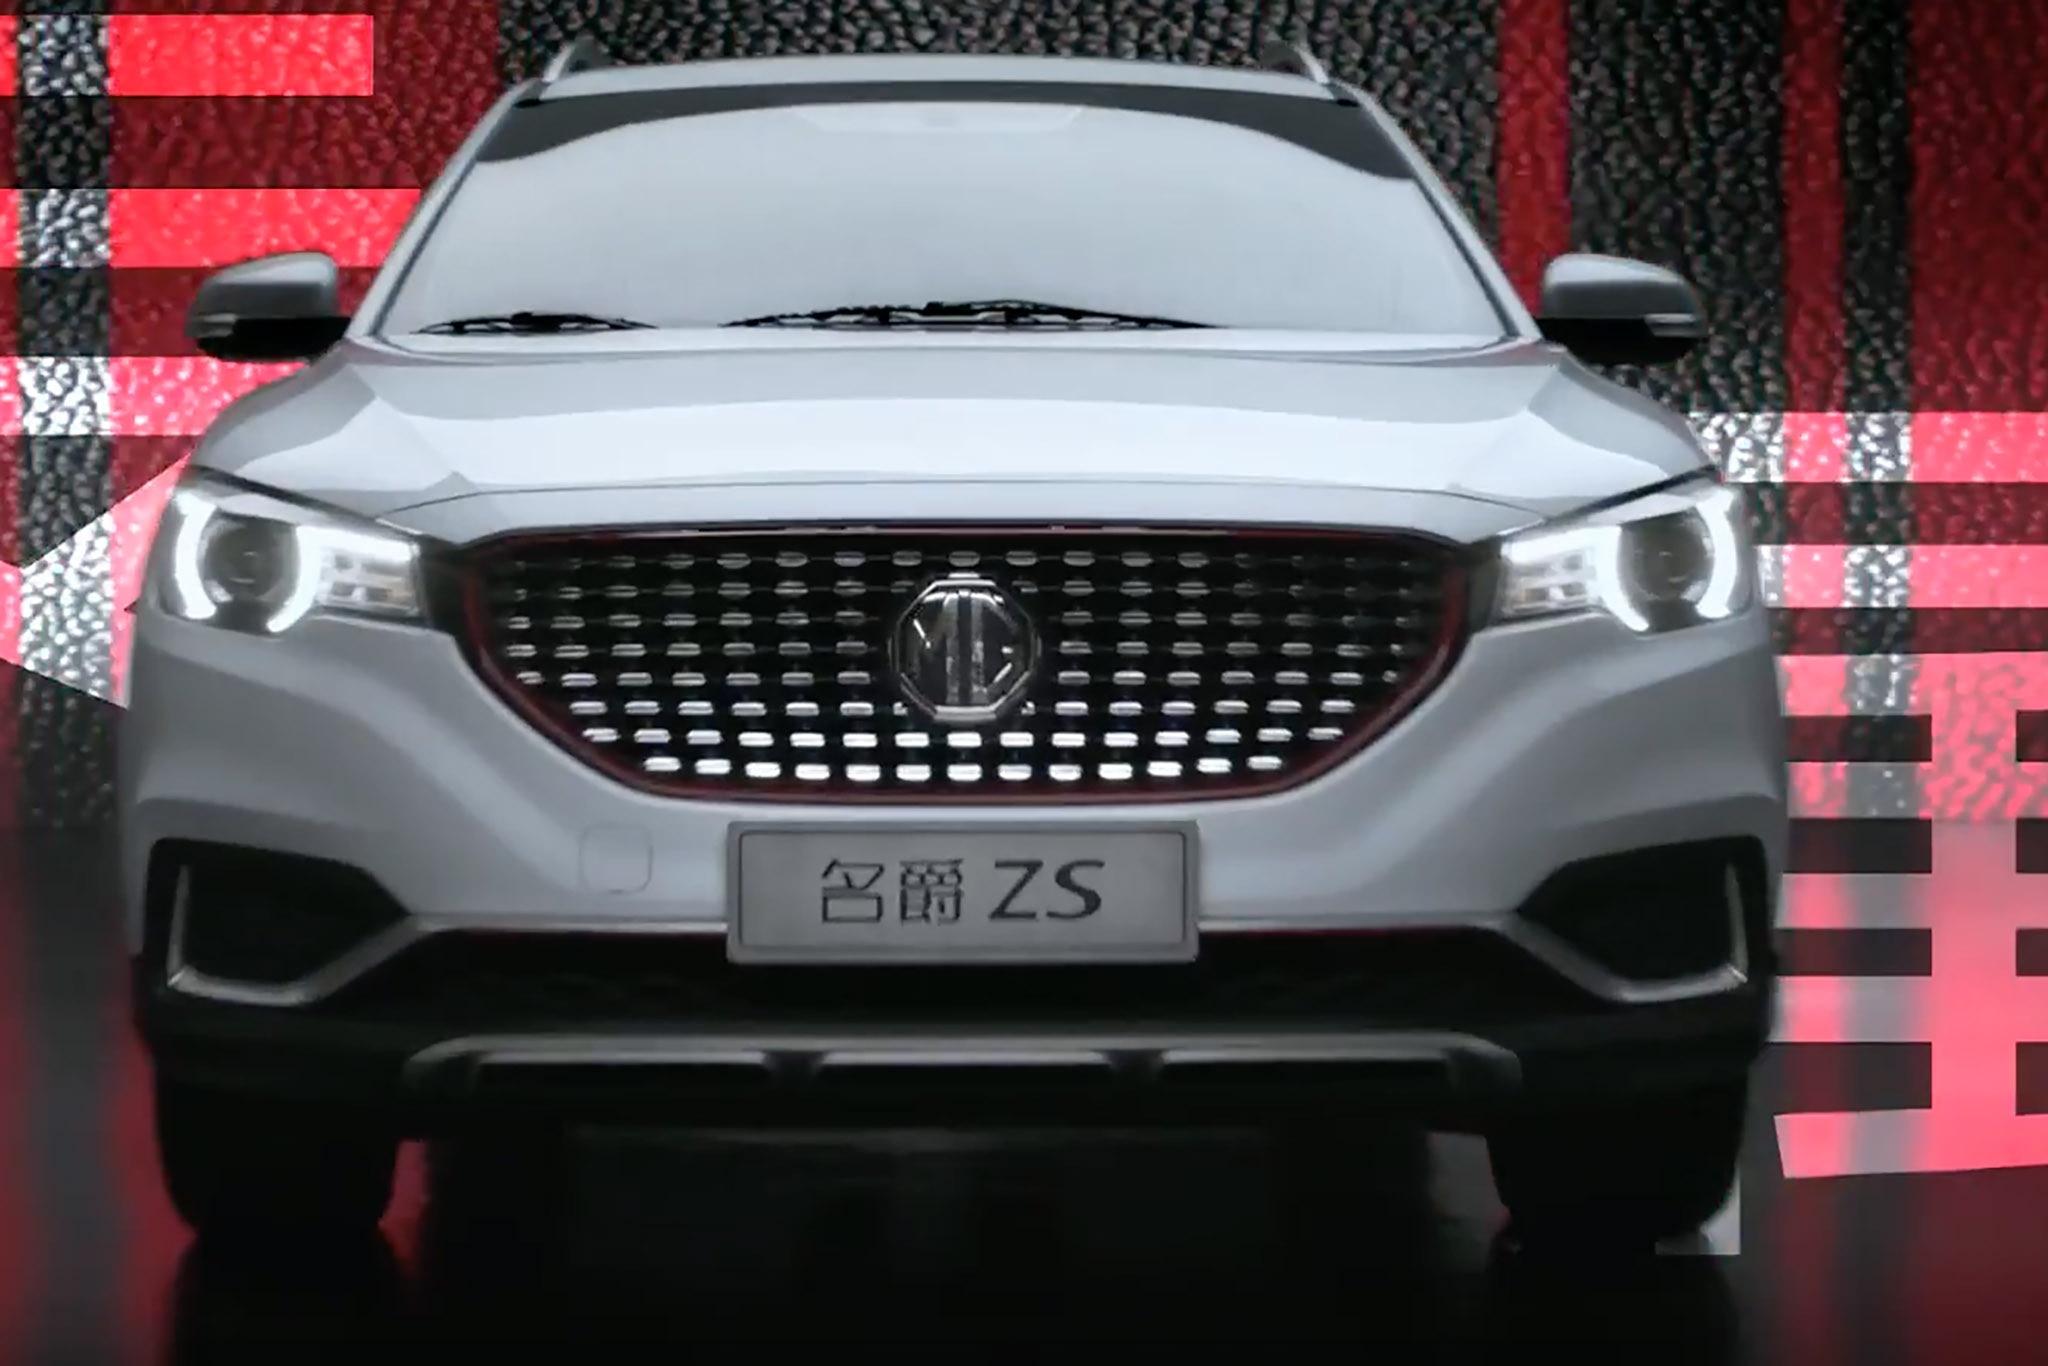 2017 Mg Zs Suv Video Revealed Automobile Magazine